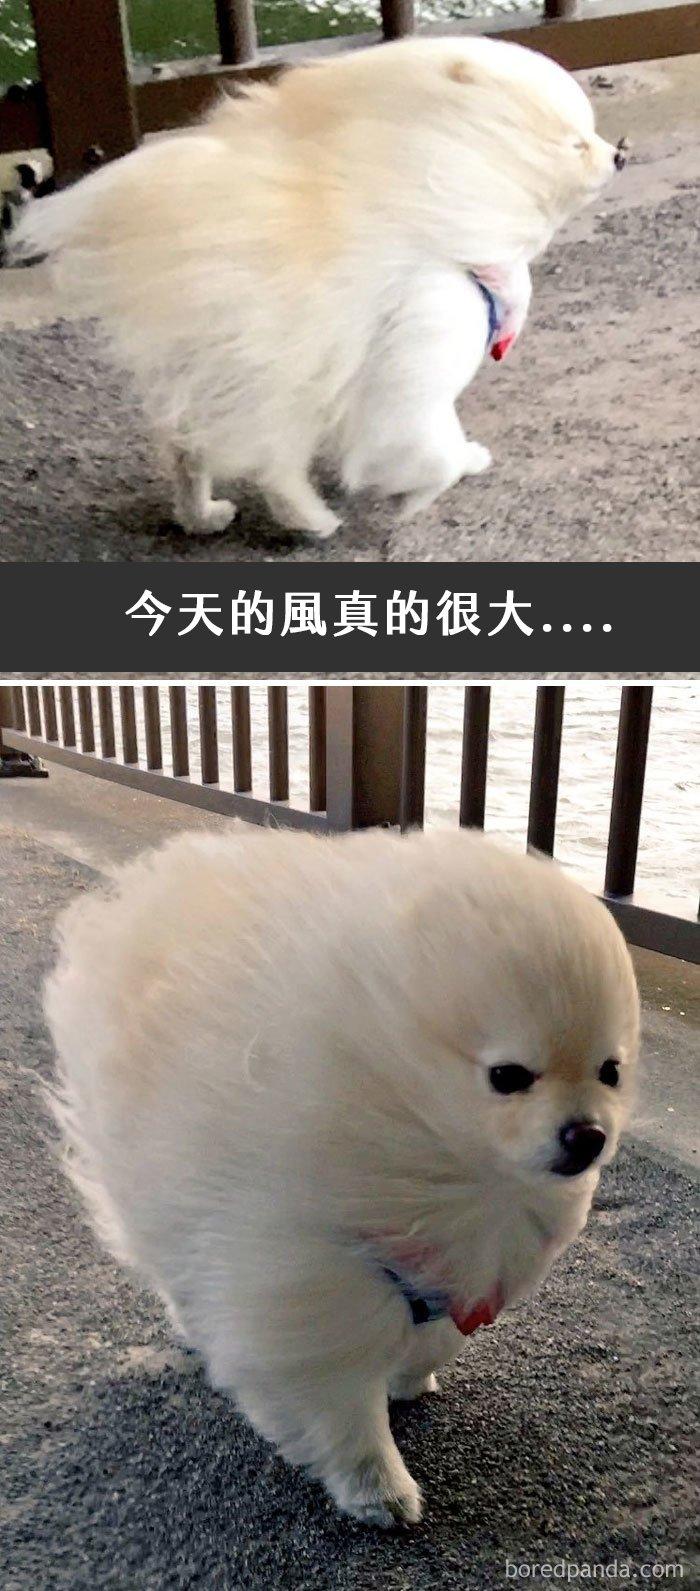 dogs-funny-snapchats-211-5a37862026dc6__700